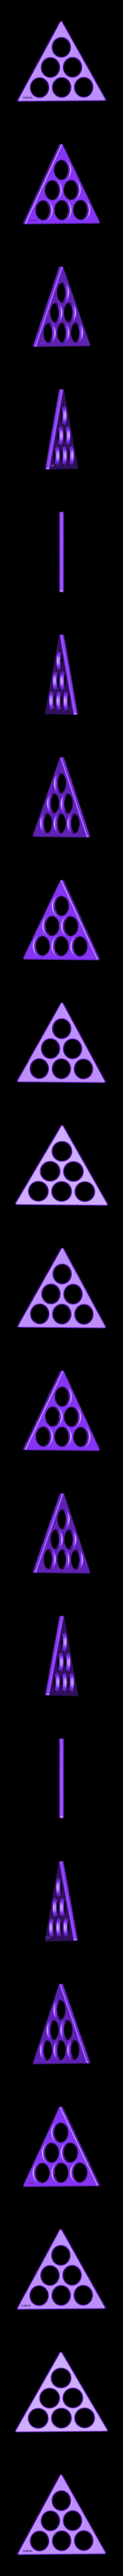 Magic_Triangle_Base_2_holes.stl Download free STL file Magic Triangle, Math Puzzle • 3D printing design, LGBU